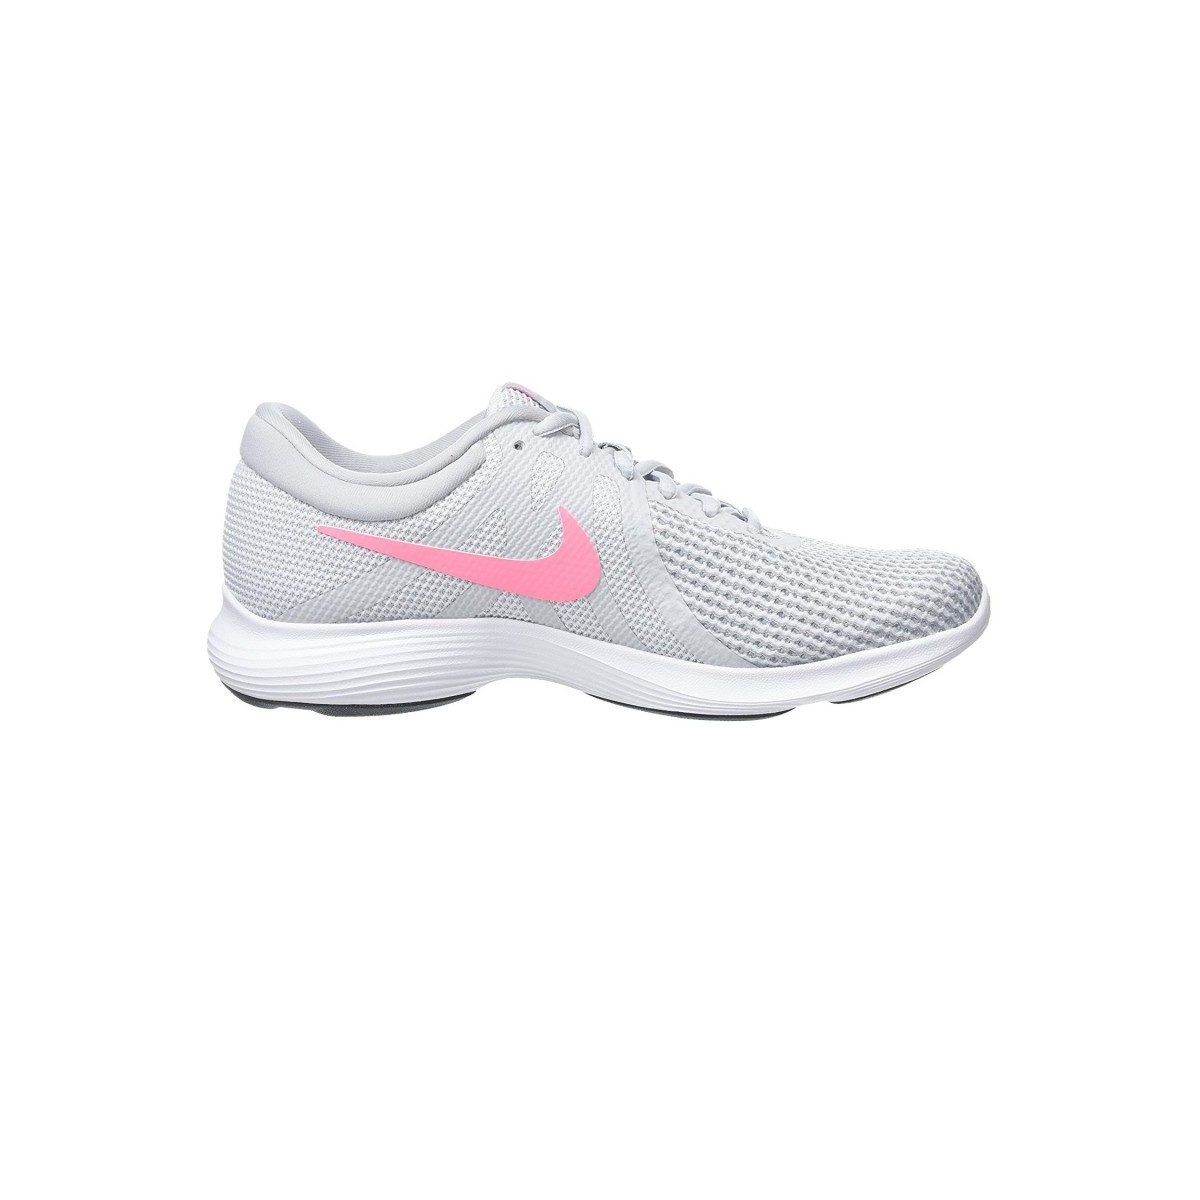 NIKE REVOLUTION 4  Nike Mujer AJ3491 . Compra Nike al mejor precio ... 3c5f764b55c96